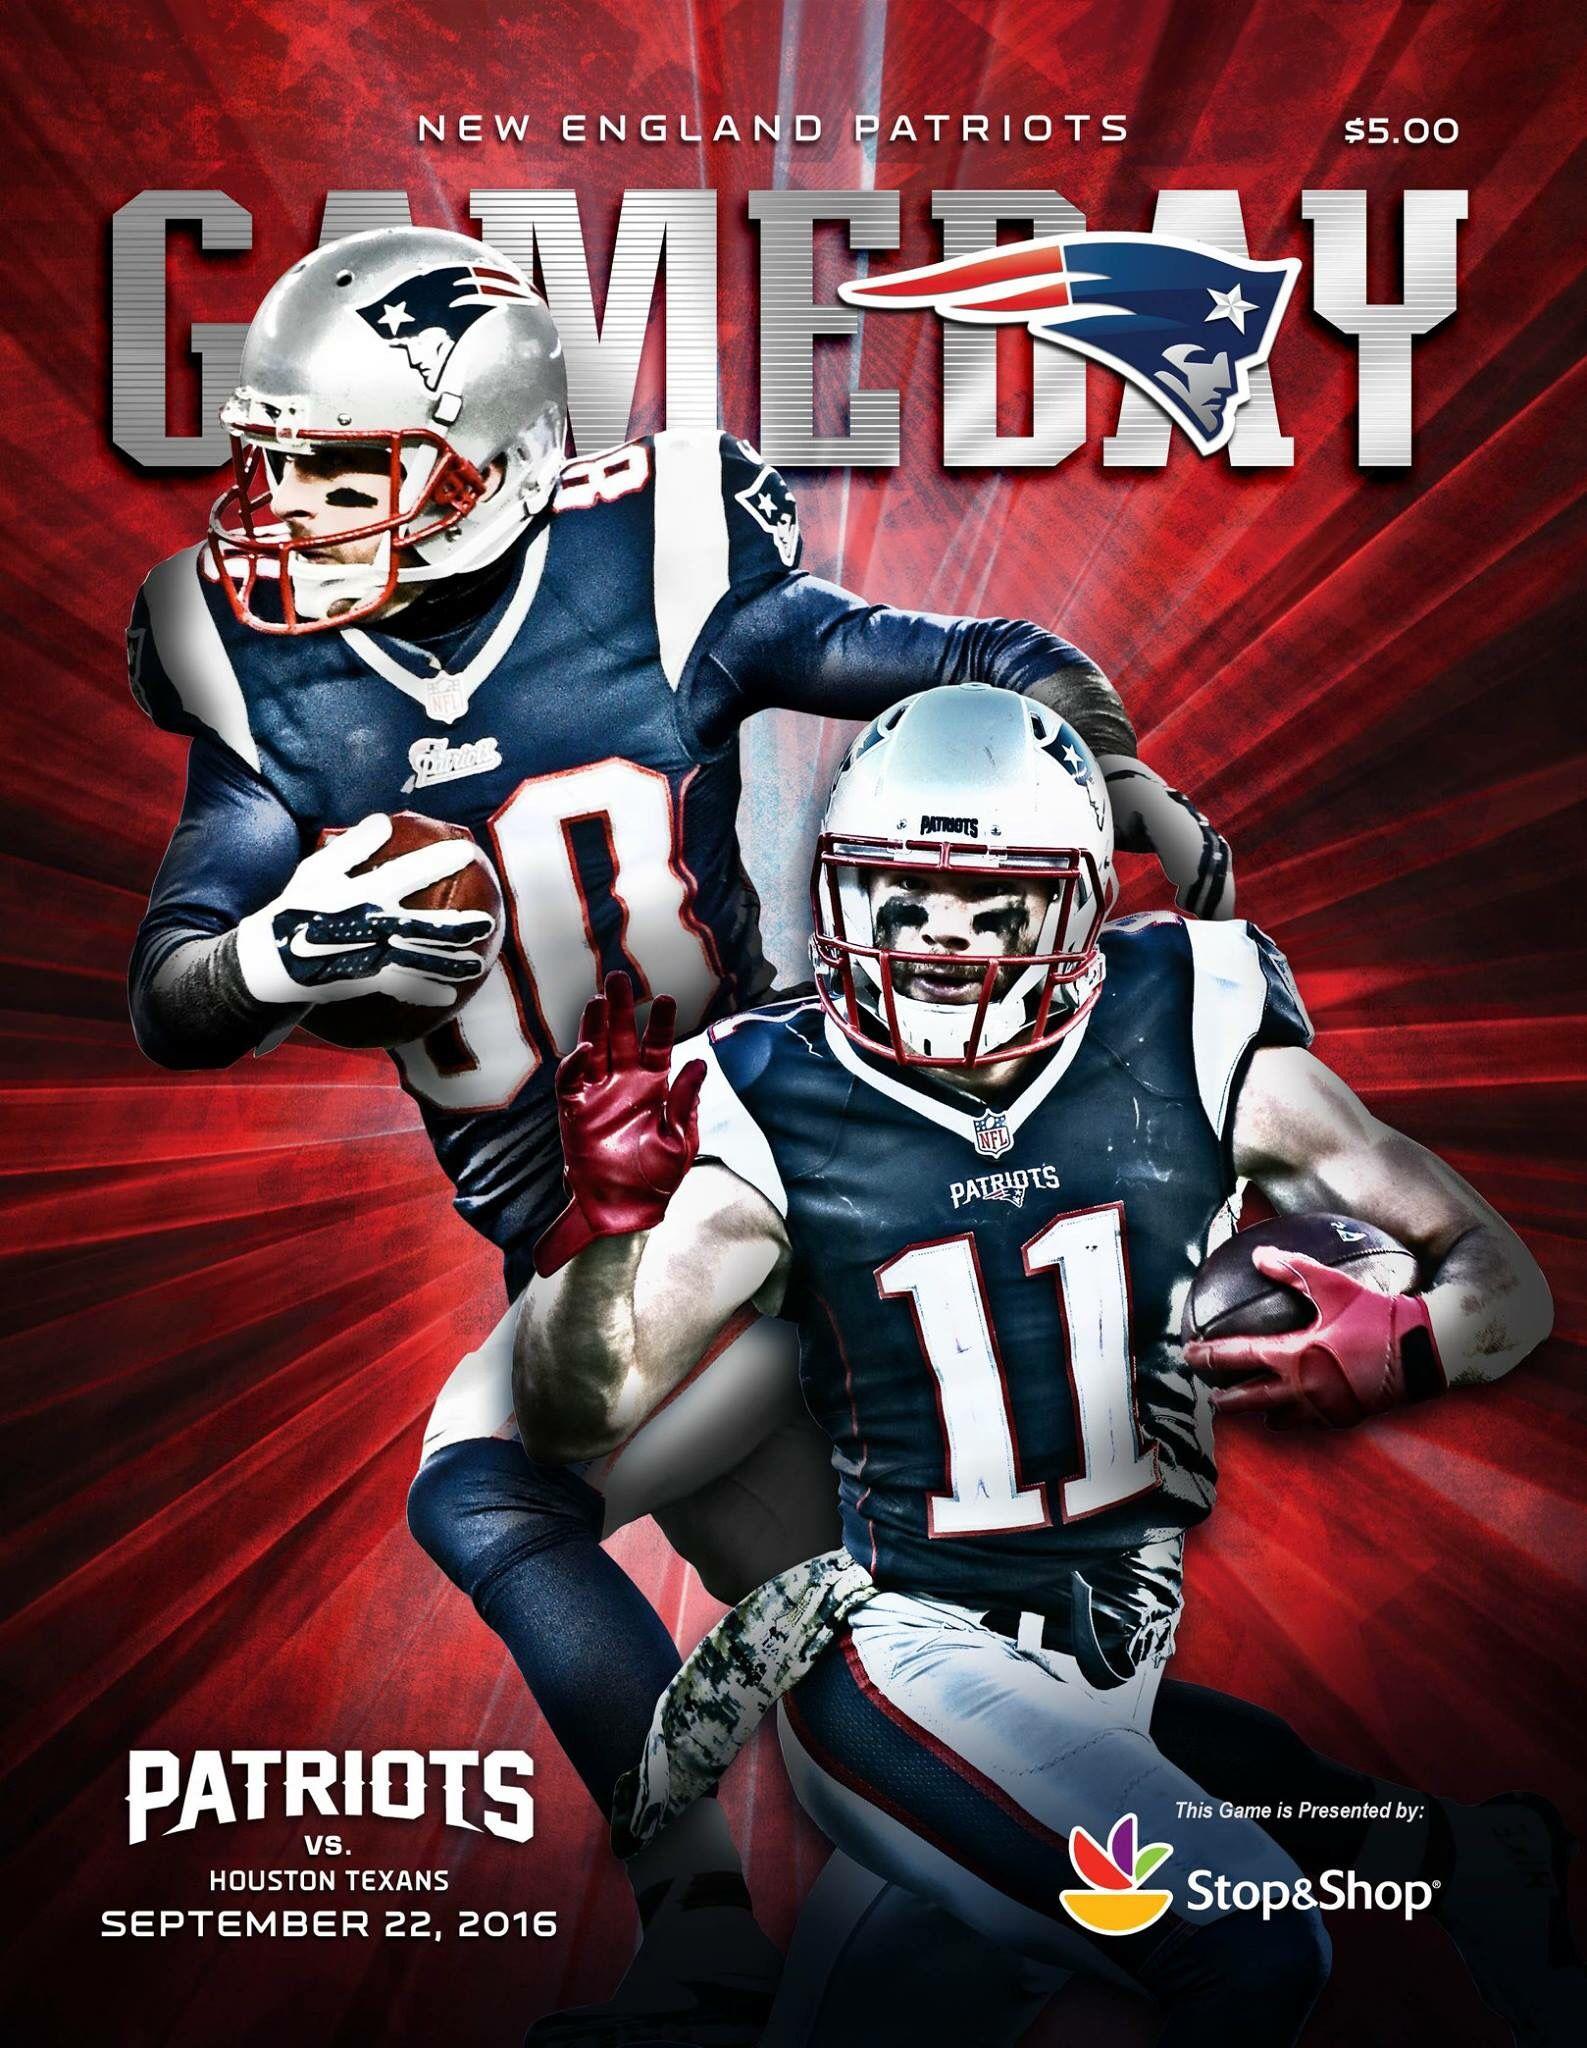 Game Day Baby New England Patriots Merchandise New England Patriots Sports Magazine